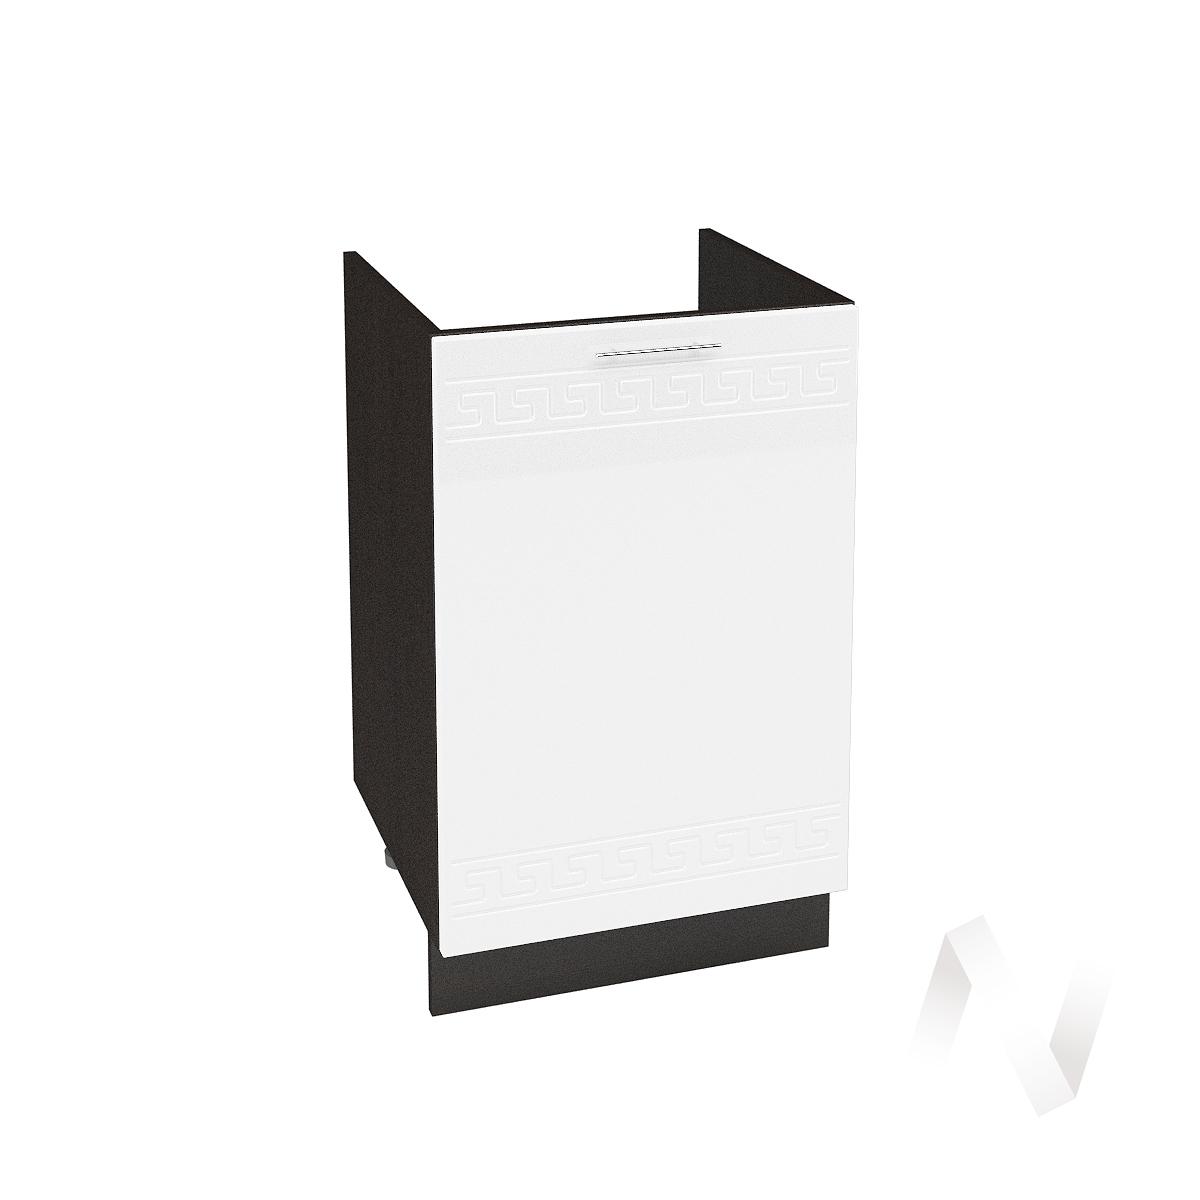 "Кухня ""Греция"": Шкаф нижний под мойку 500, ШНМ 500 (белый металлик/корпус венге)"